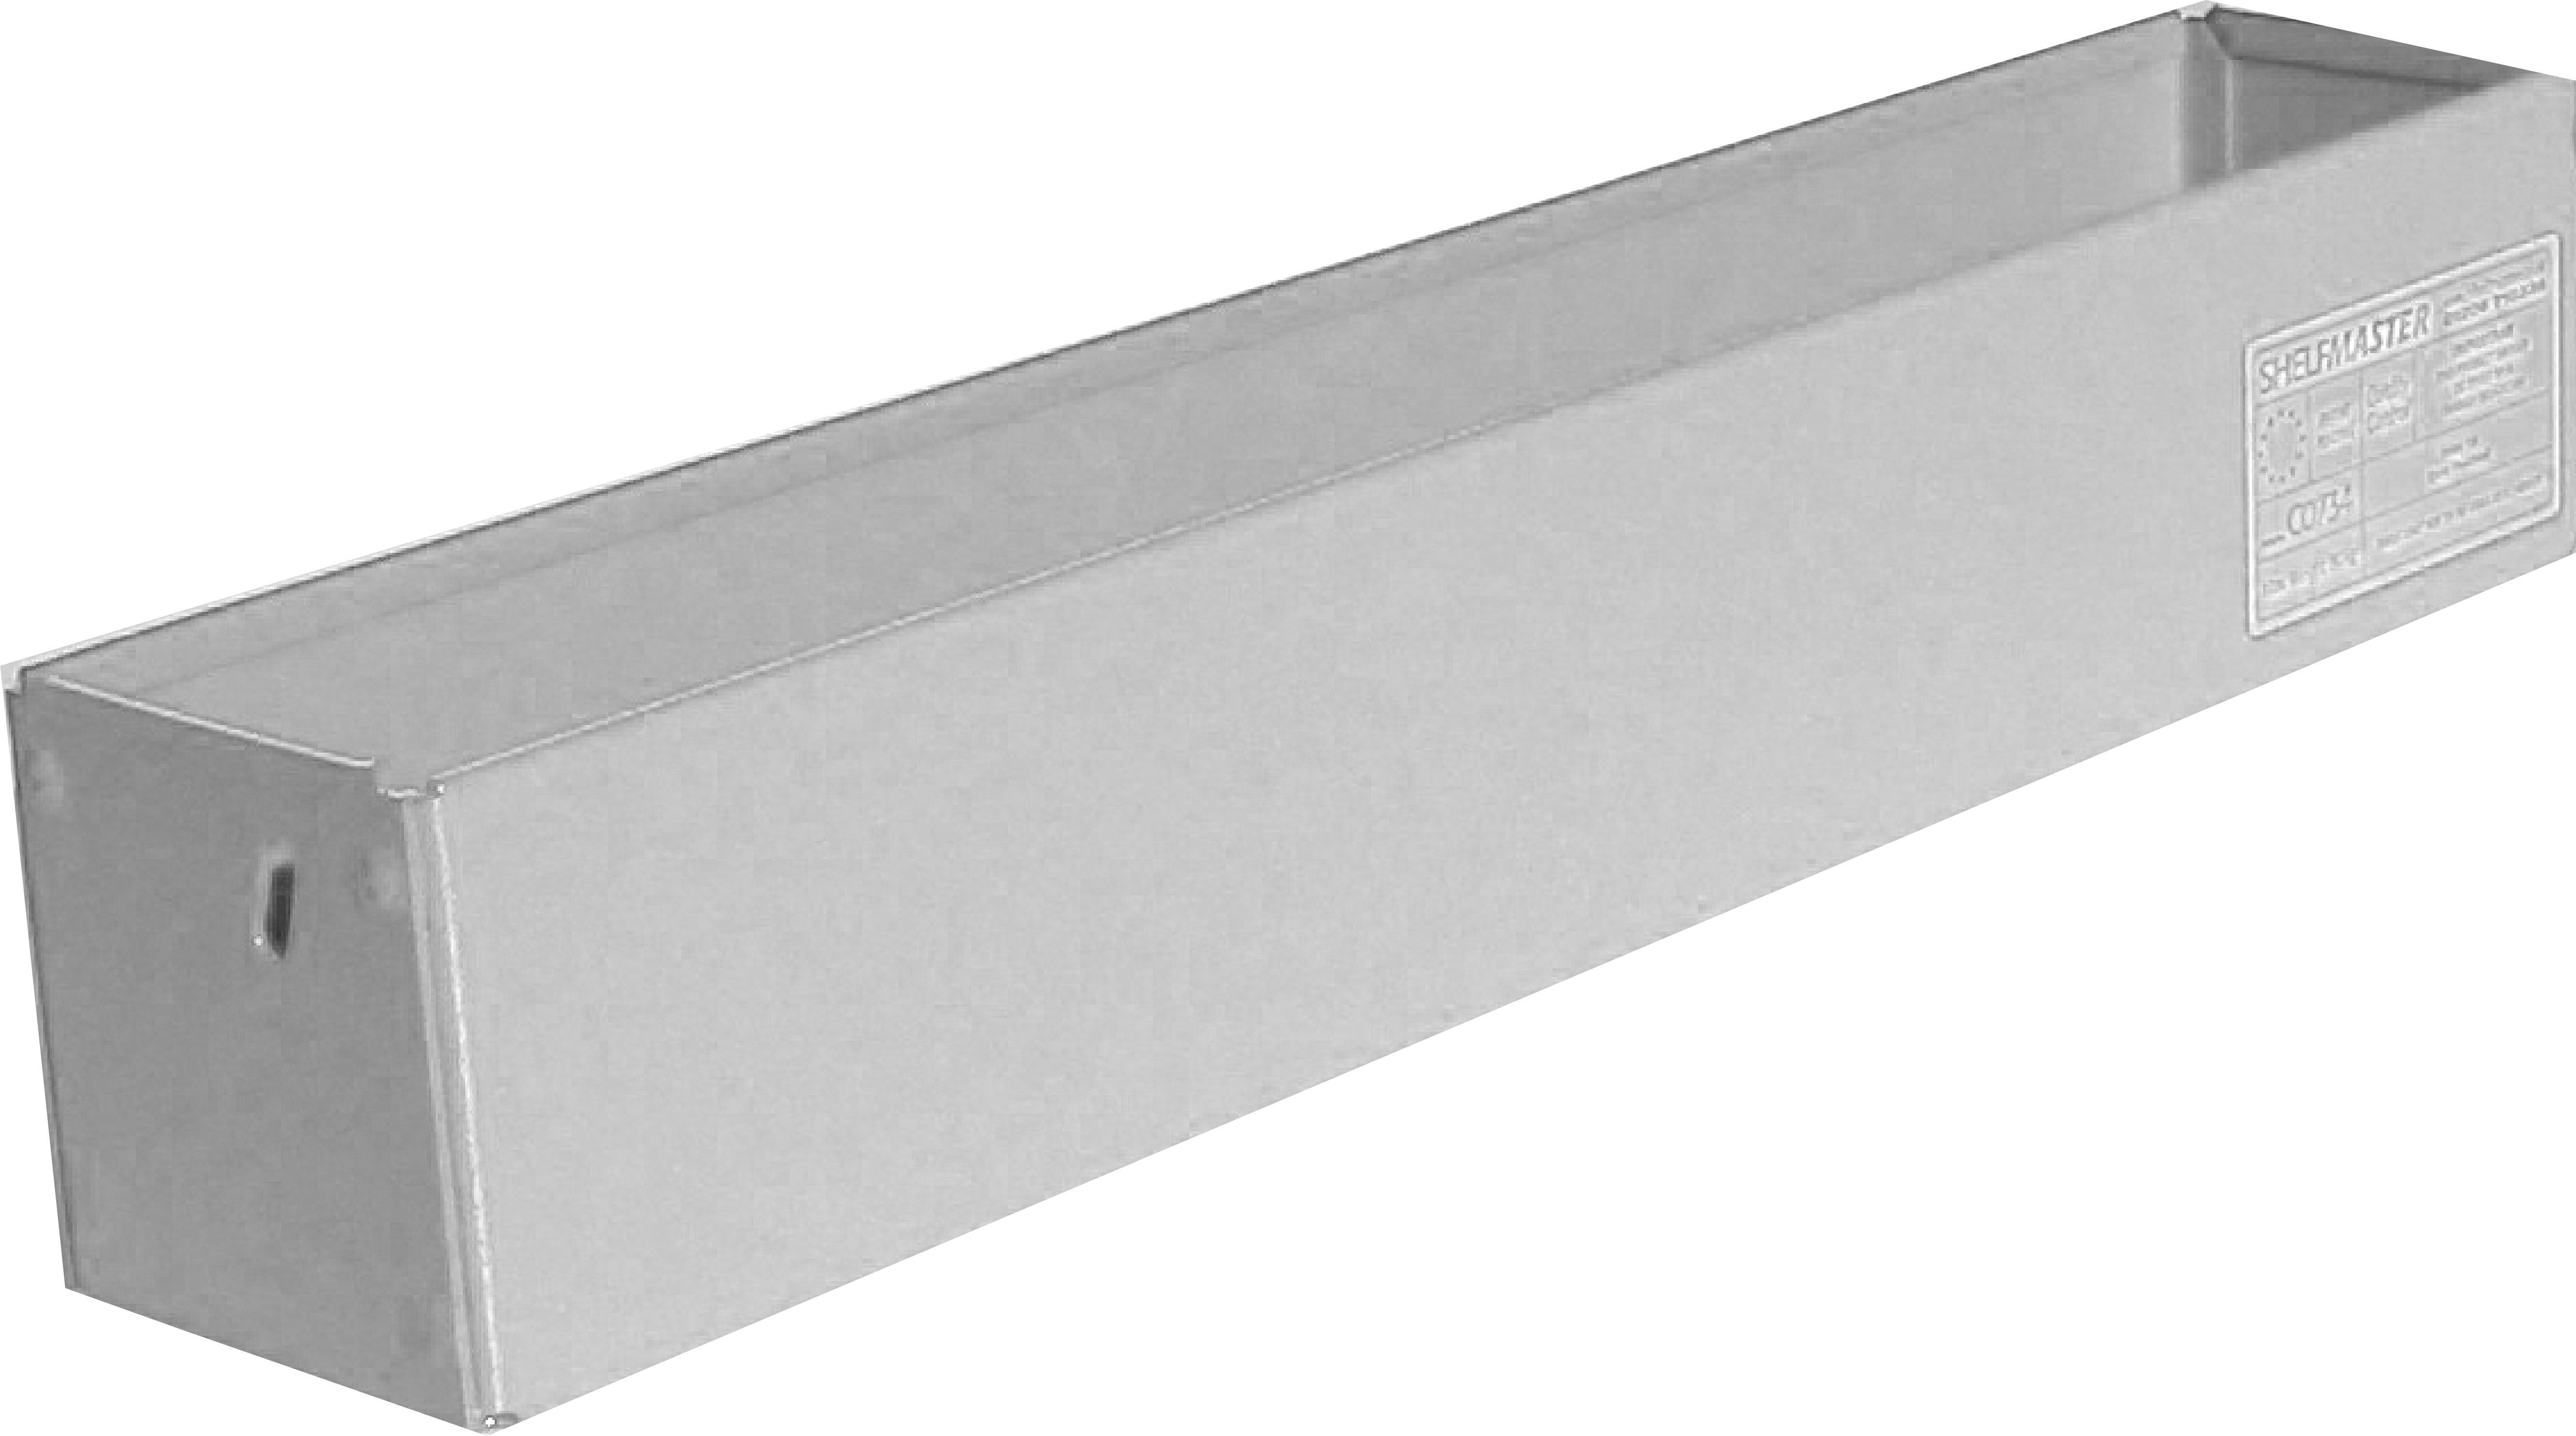 ShelfMaster Box Shelf 90mm x 90mm x 480mm | SMBS 90/90